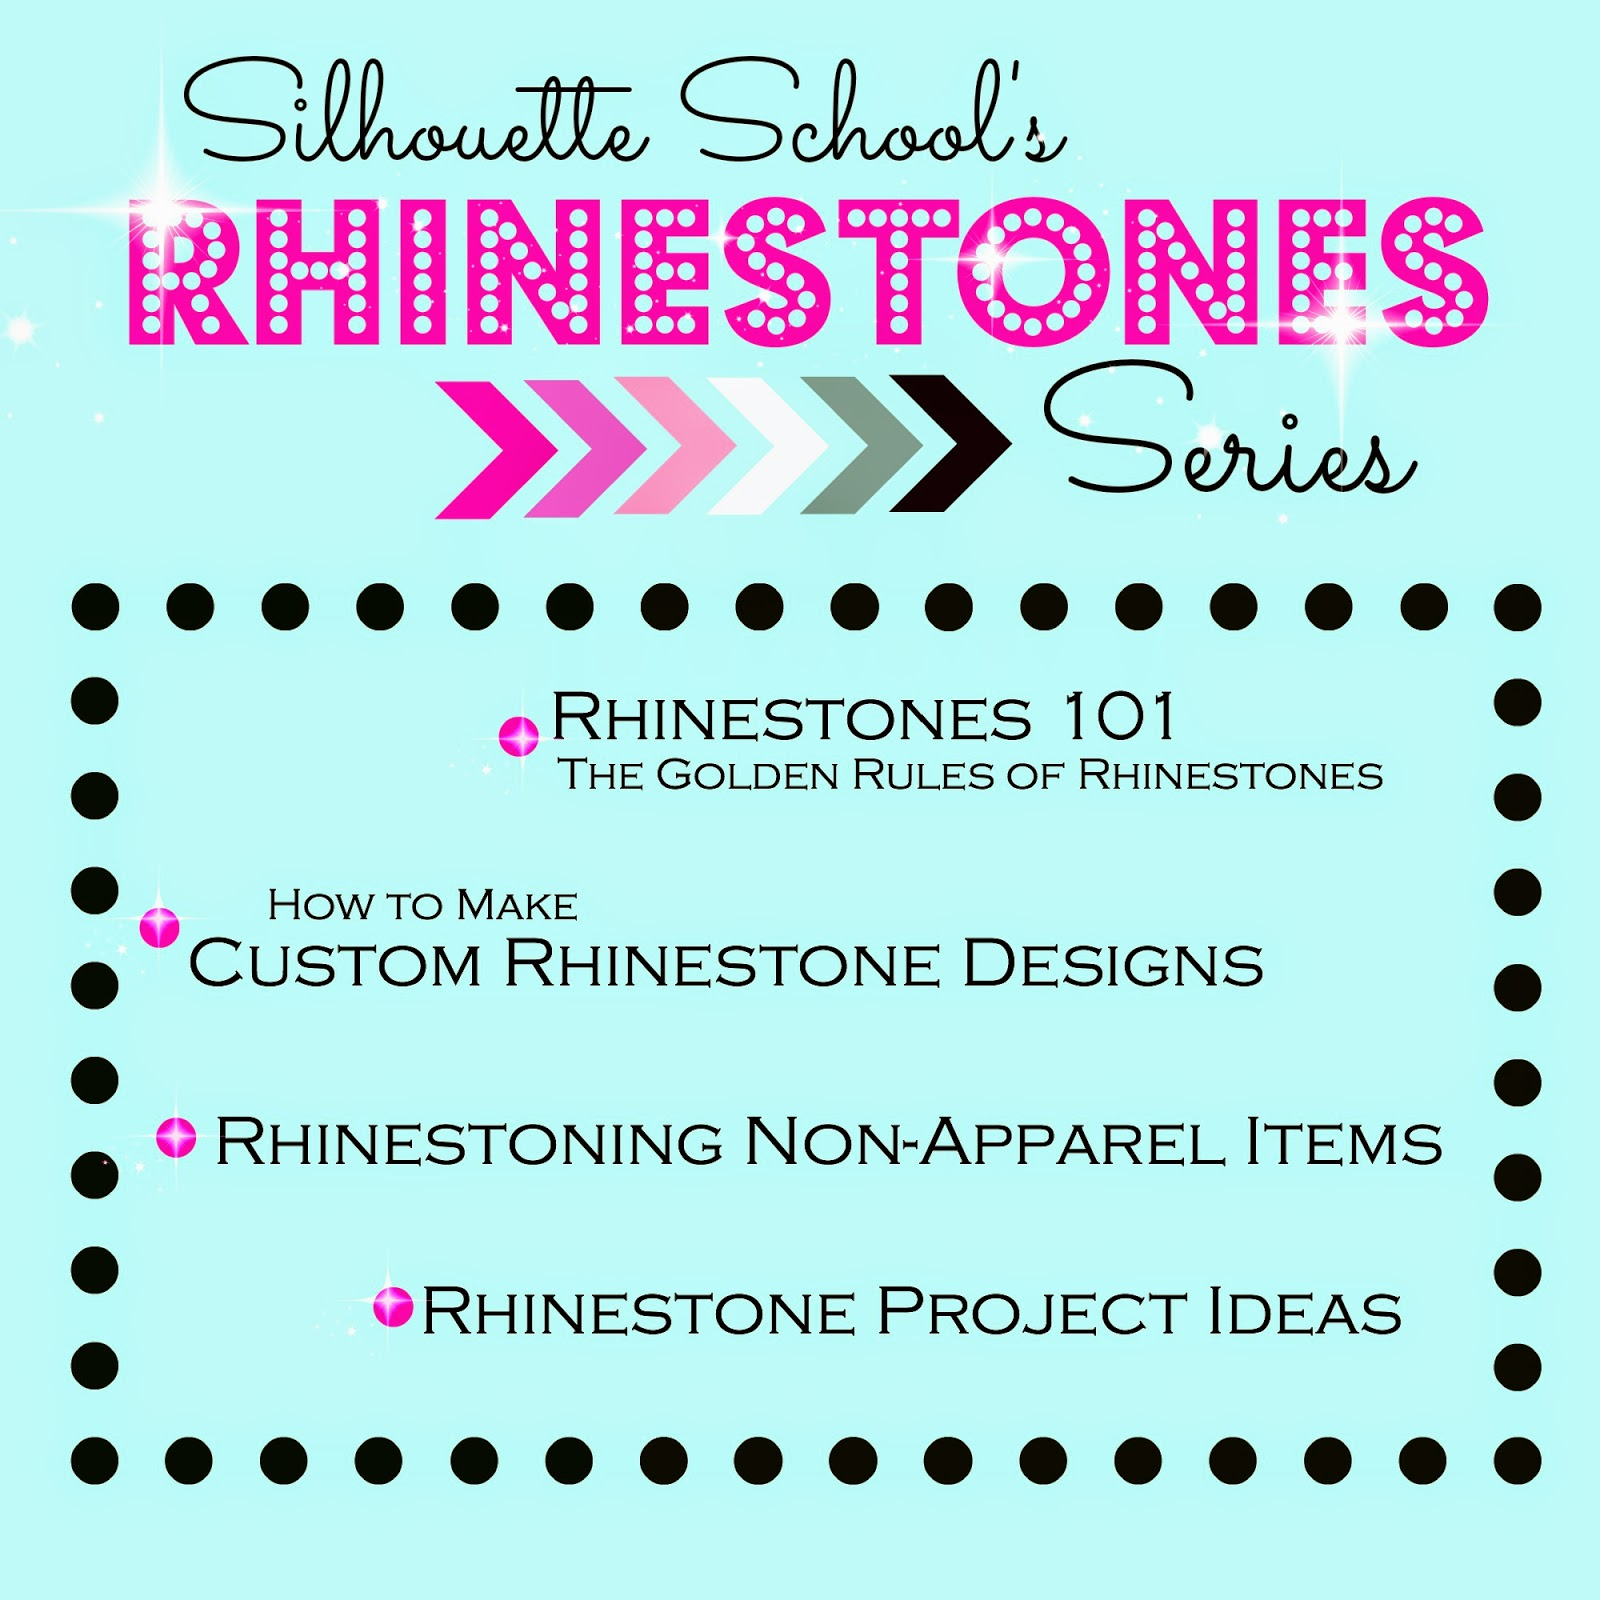 http://www.silhouetteschool.blogspot.com/search/label/Rhinestones%20Series